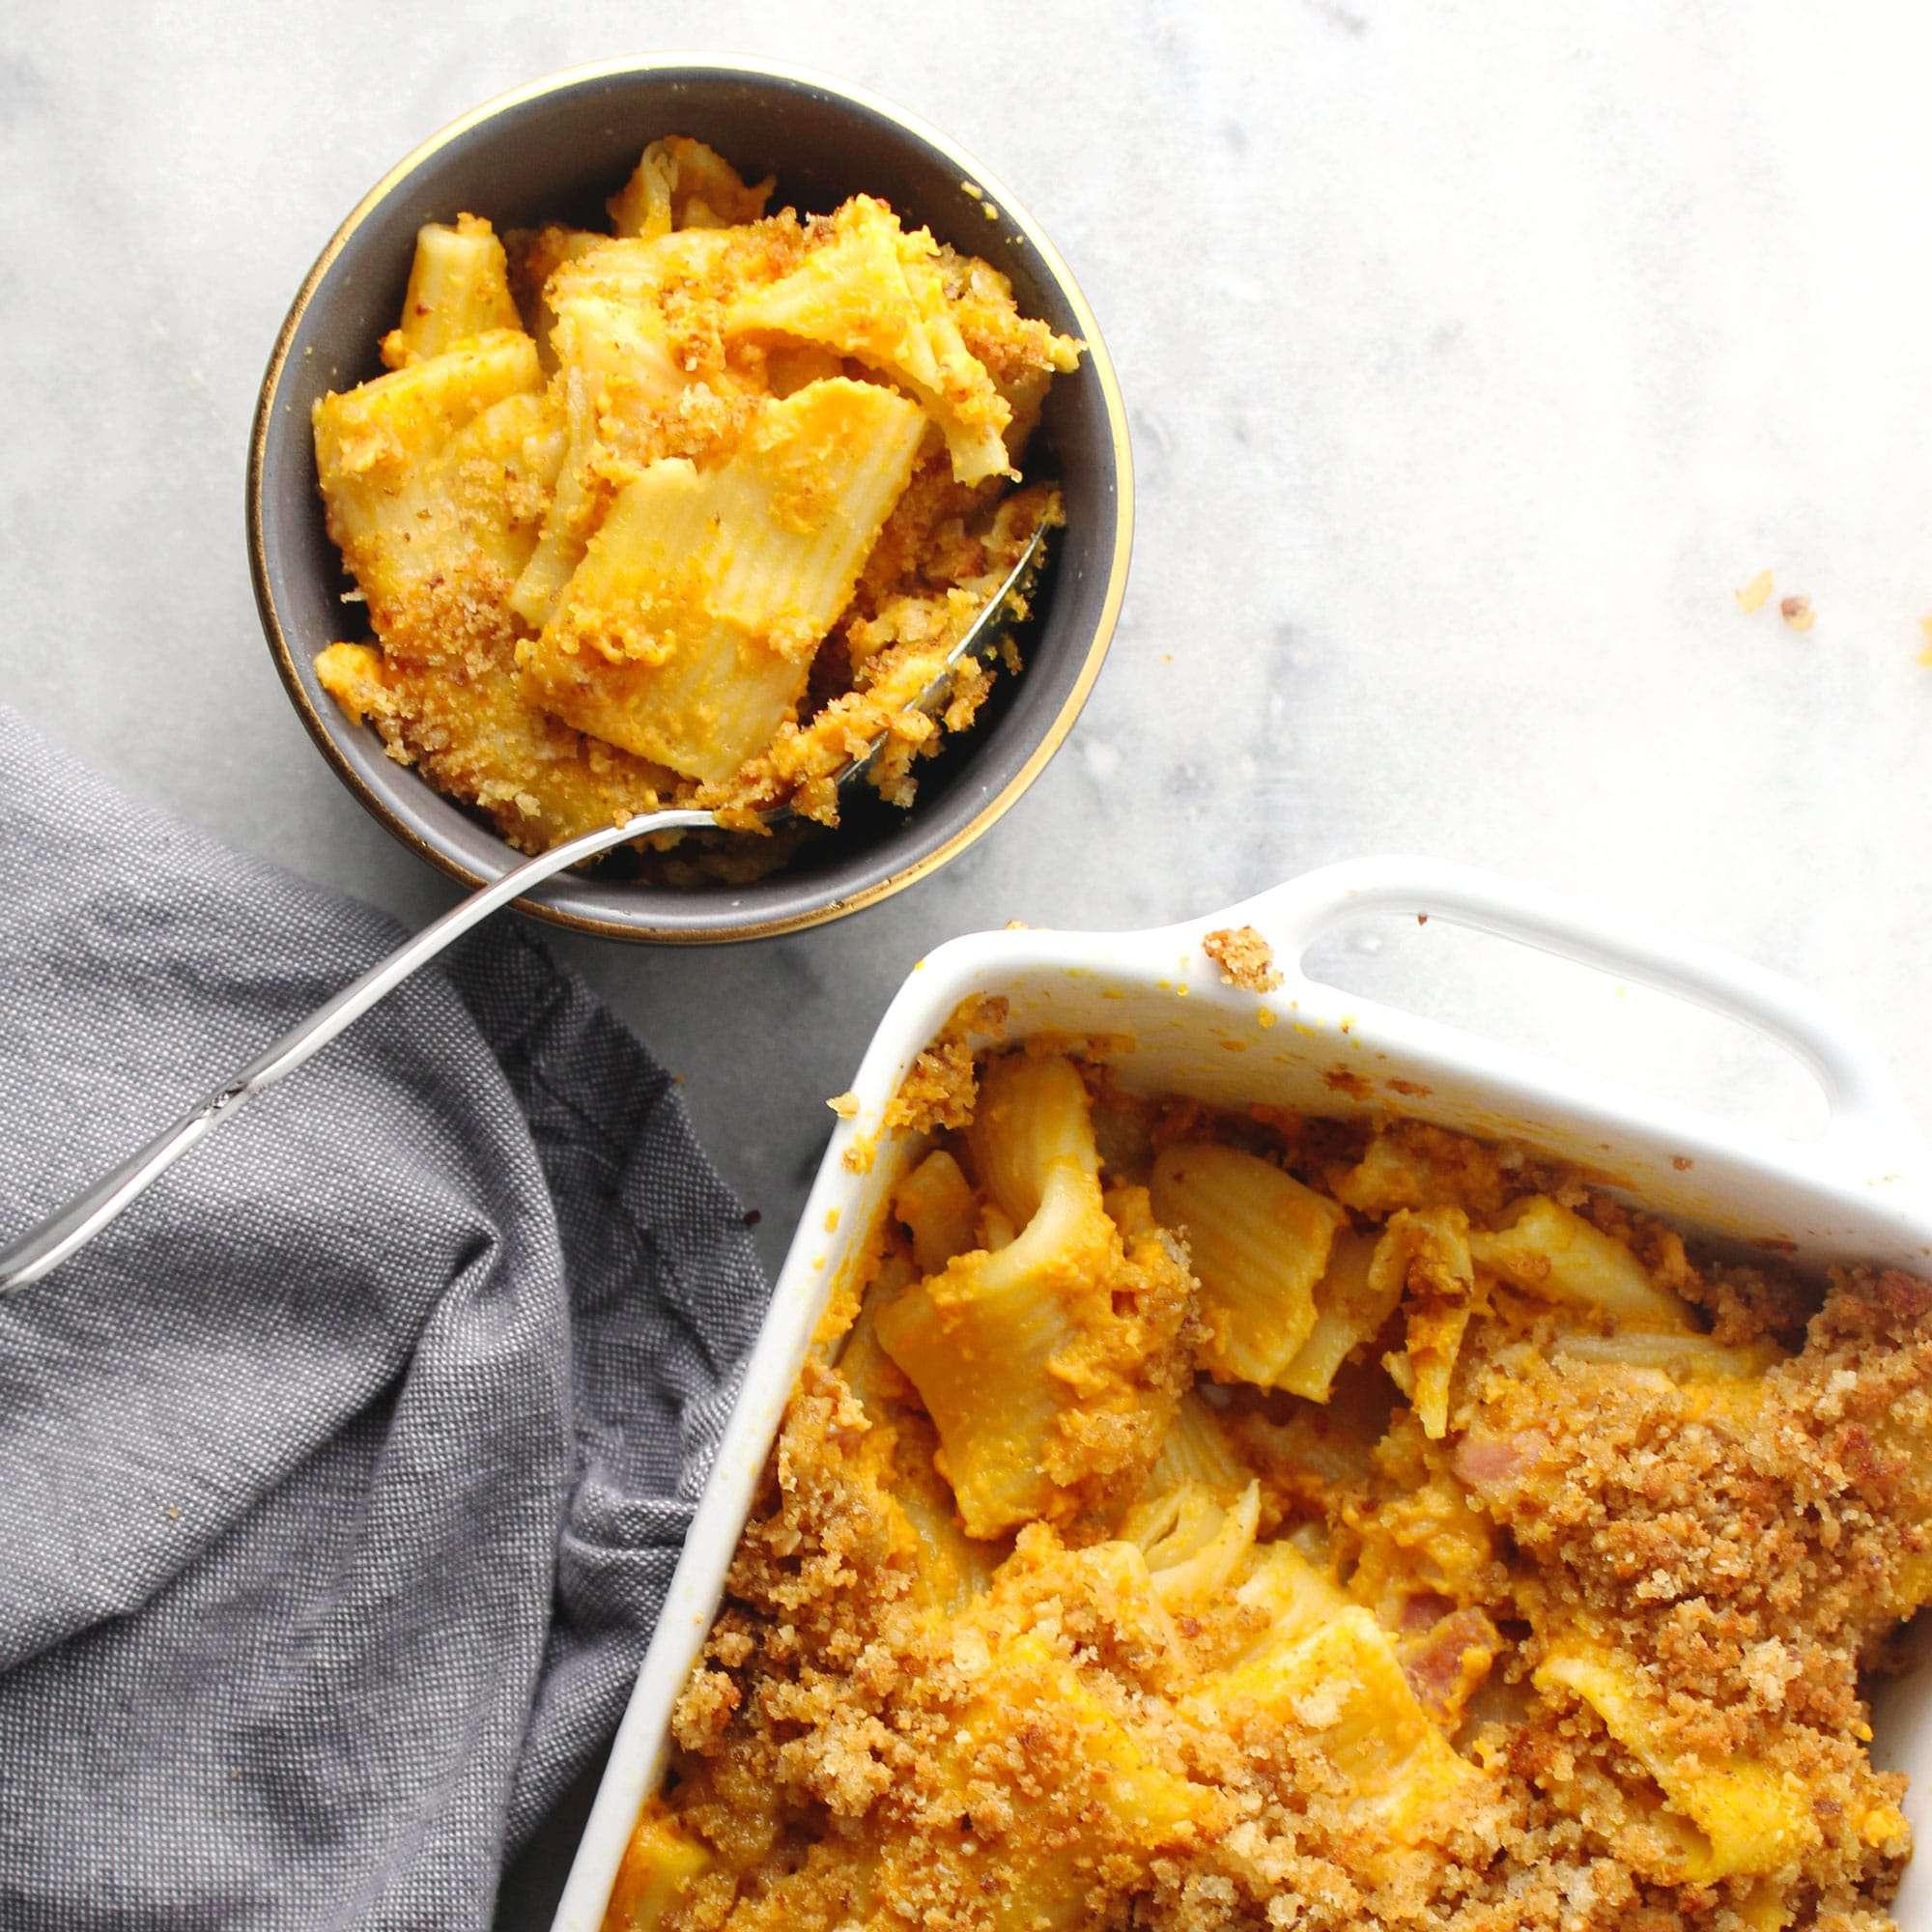 Exceptionally cheesy and super creamy, this Pancetta Pumpkin Baked Pasta (aka pumpkin mac & cheese) is fall's guiltiest flavorful pleasure | via @AimeeMarsLiving | #Pumpkin #Pasta #Mac&Cheese